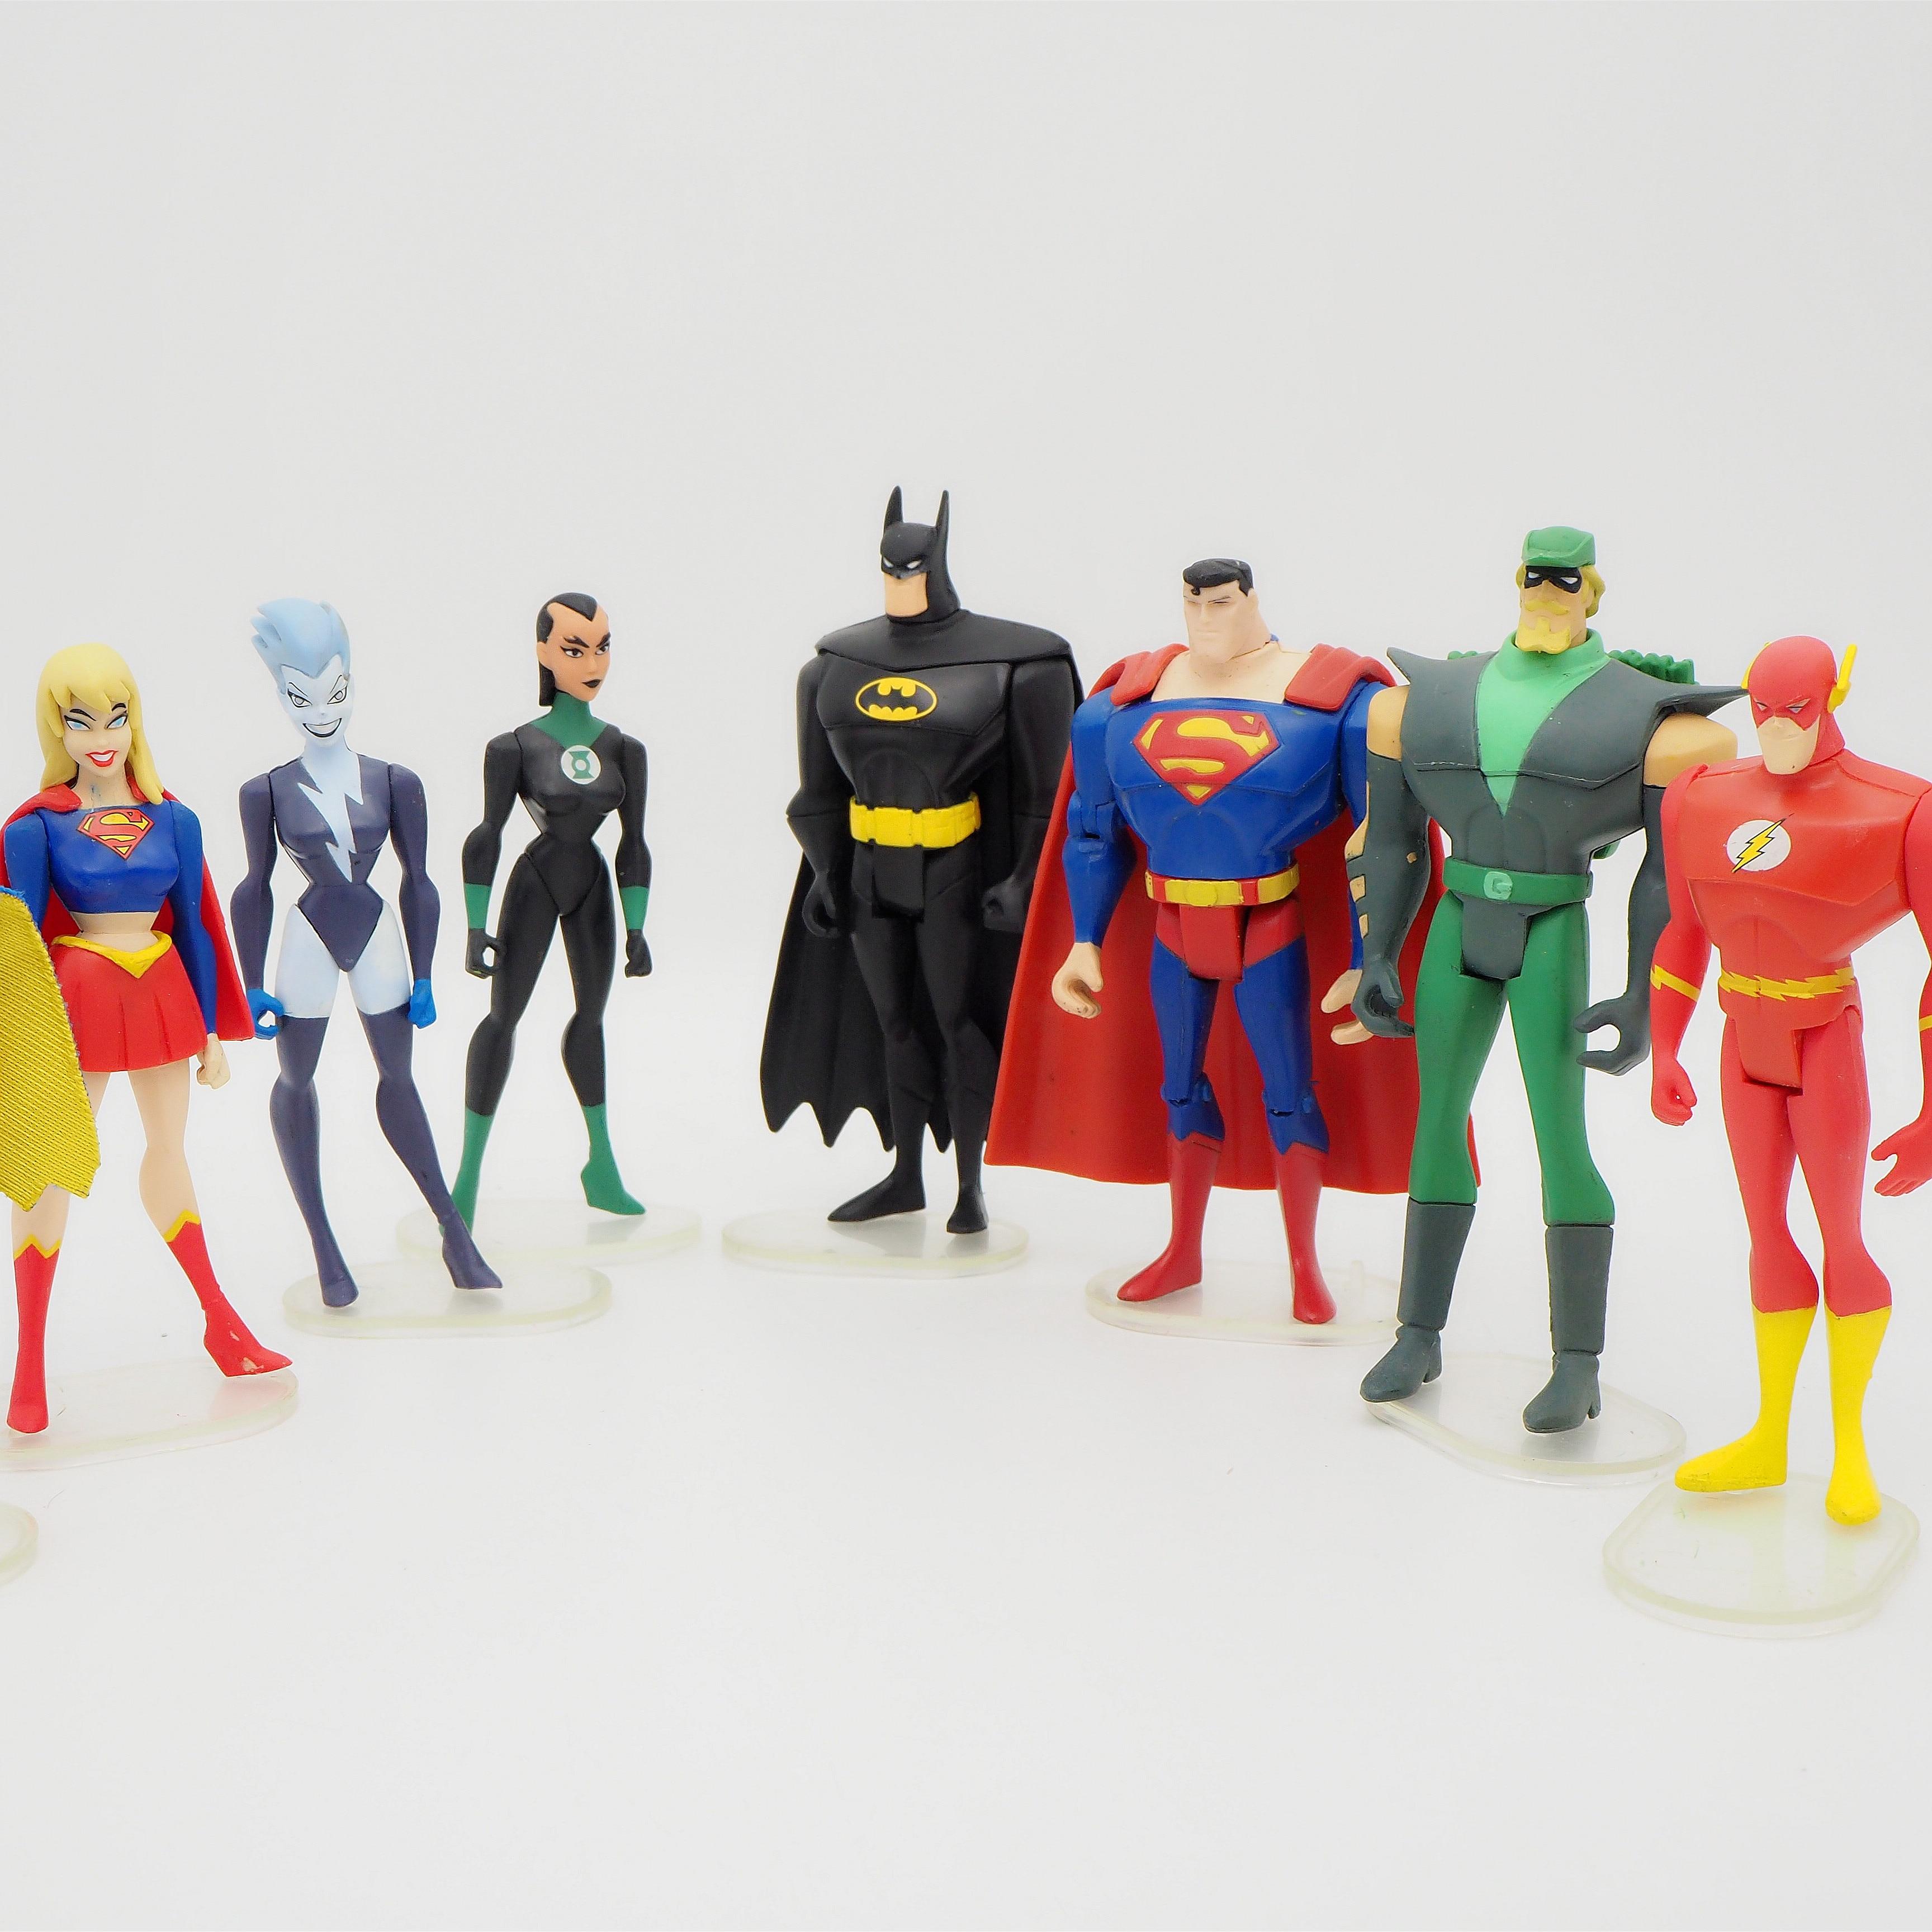 JUSTICE LEAGUE Avengers UNLIMITED DC Universe Super Hero Action Figures Toys 3.75inch